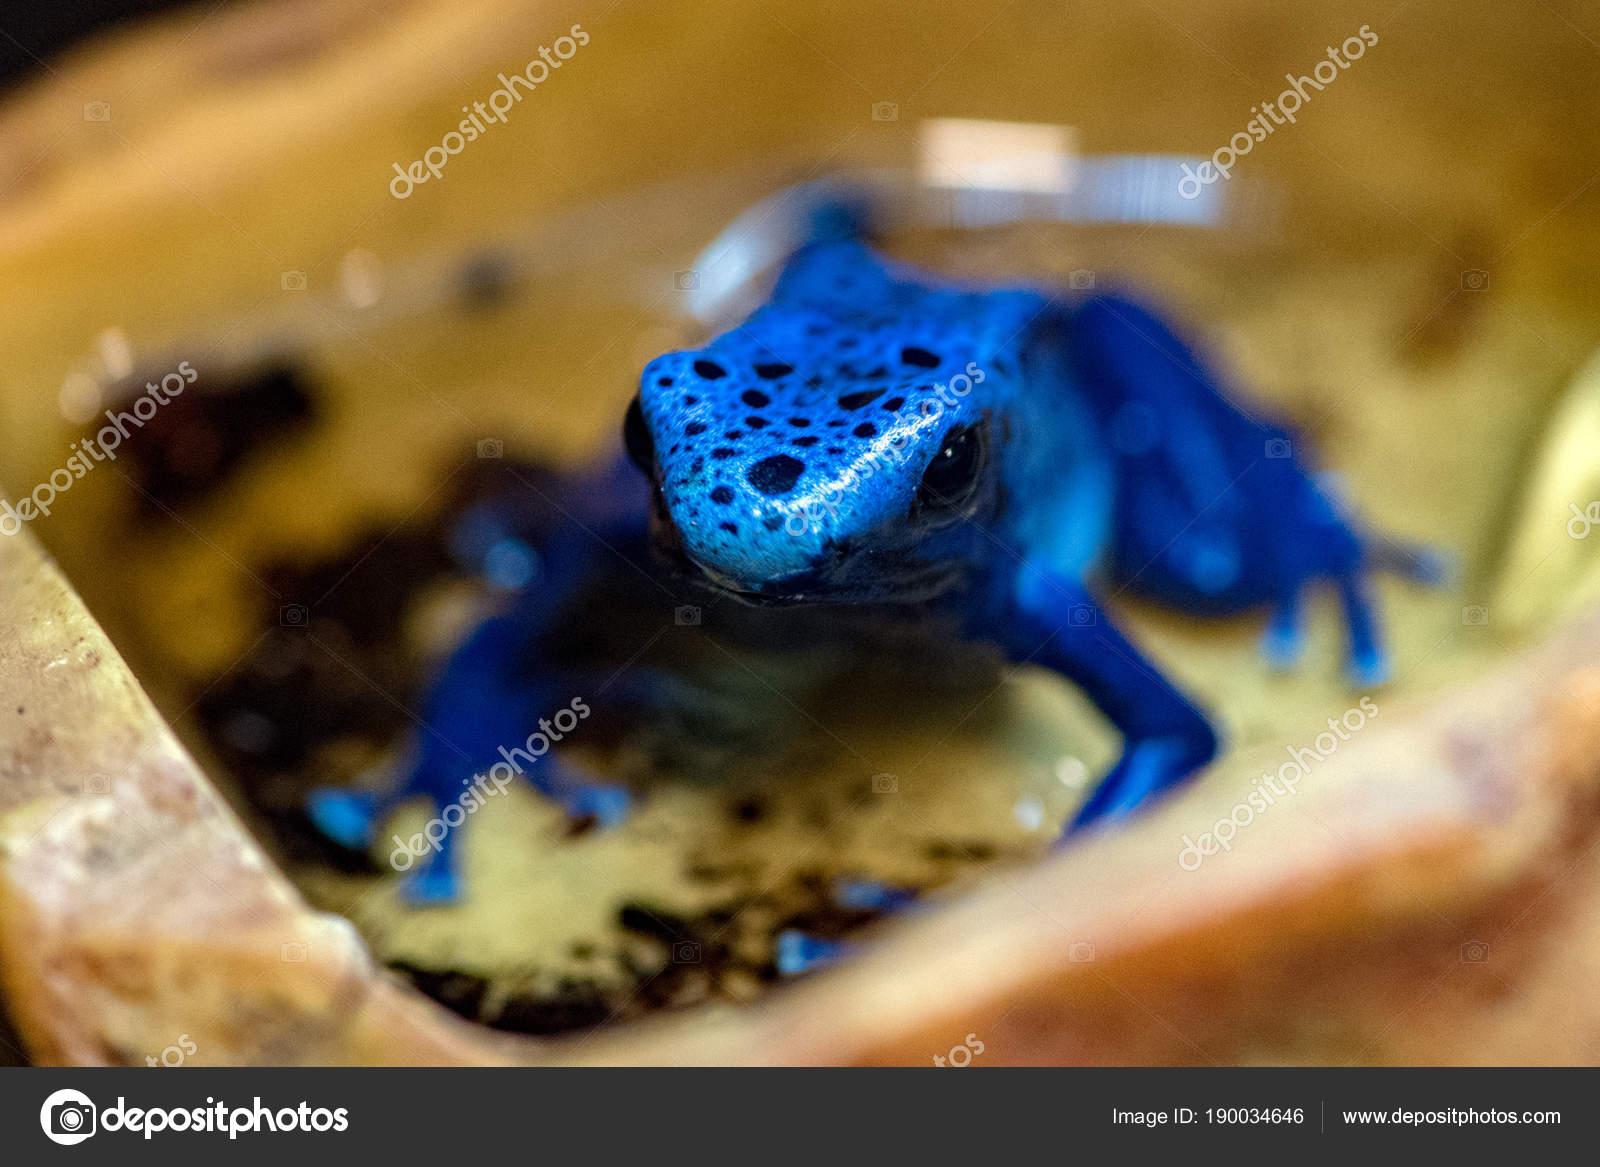 Grenouille Bleue Venimeuse teinture mortel grenouille venimeuse bleue — photographie izanbar